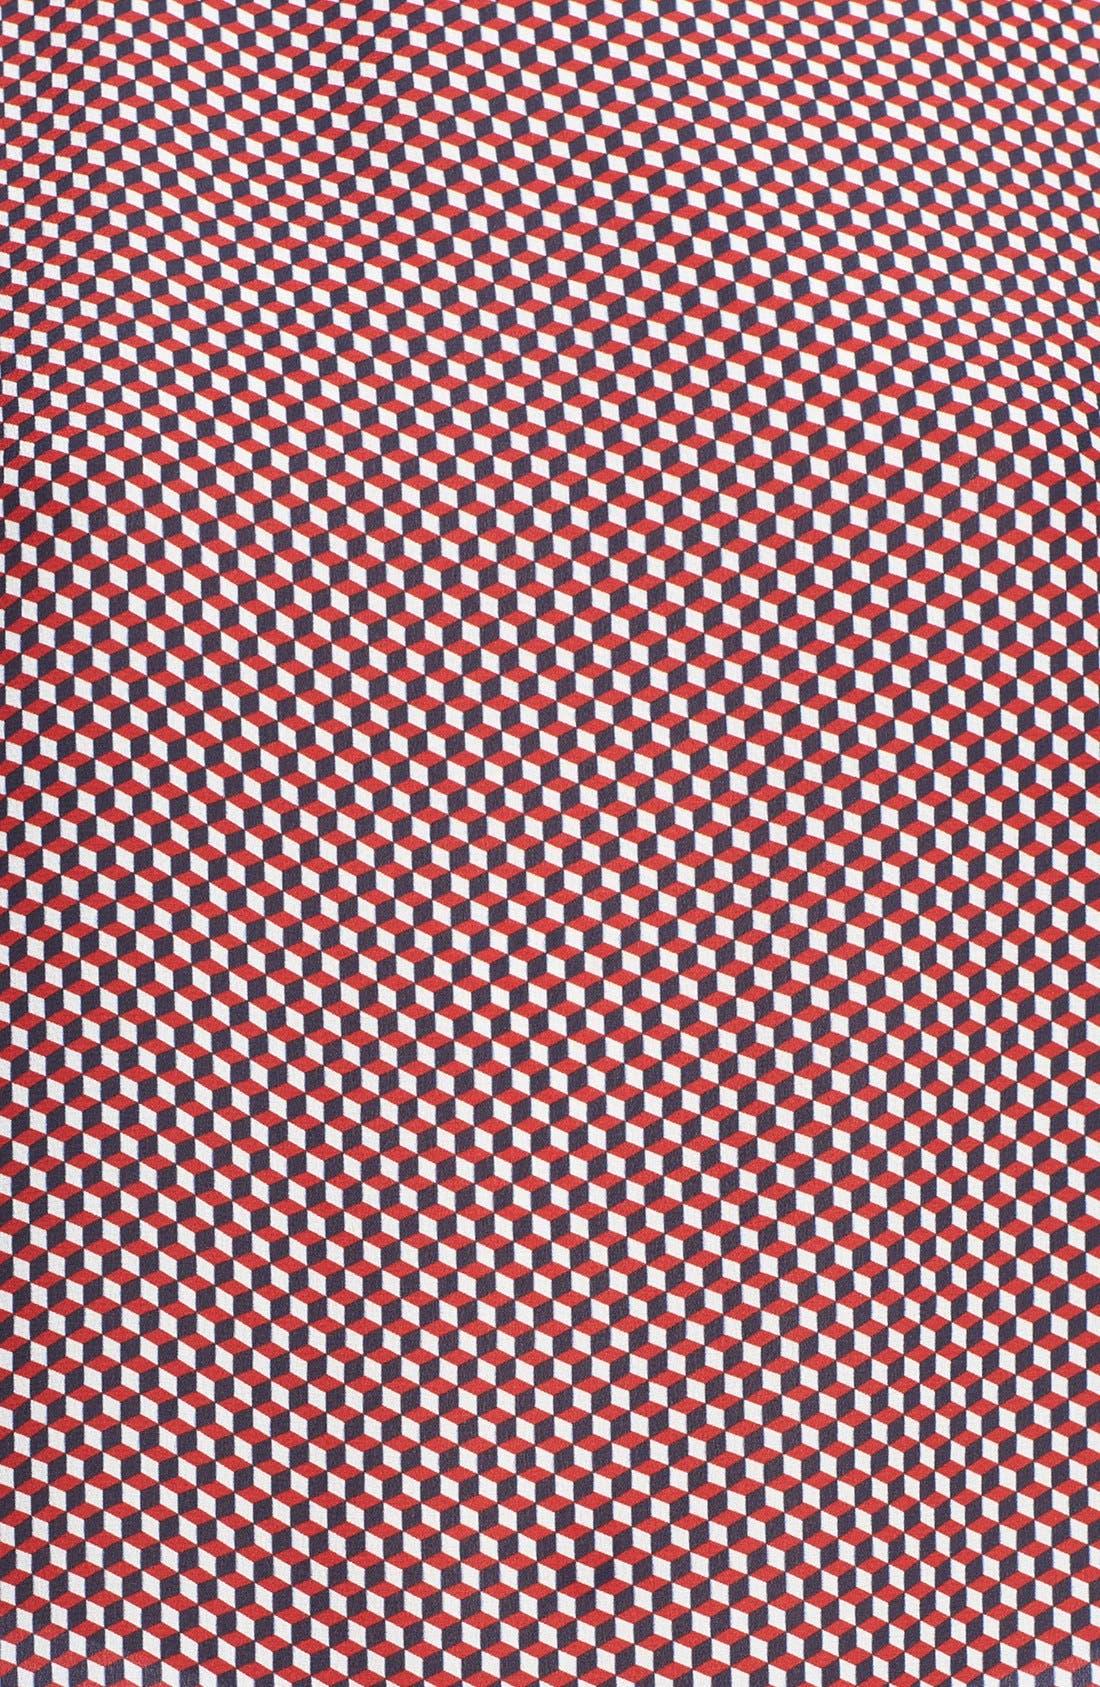 Alternate Image 3  - Theory 'Toska' Print Silk Blouse